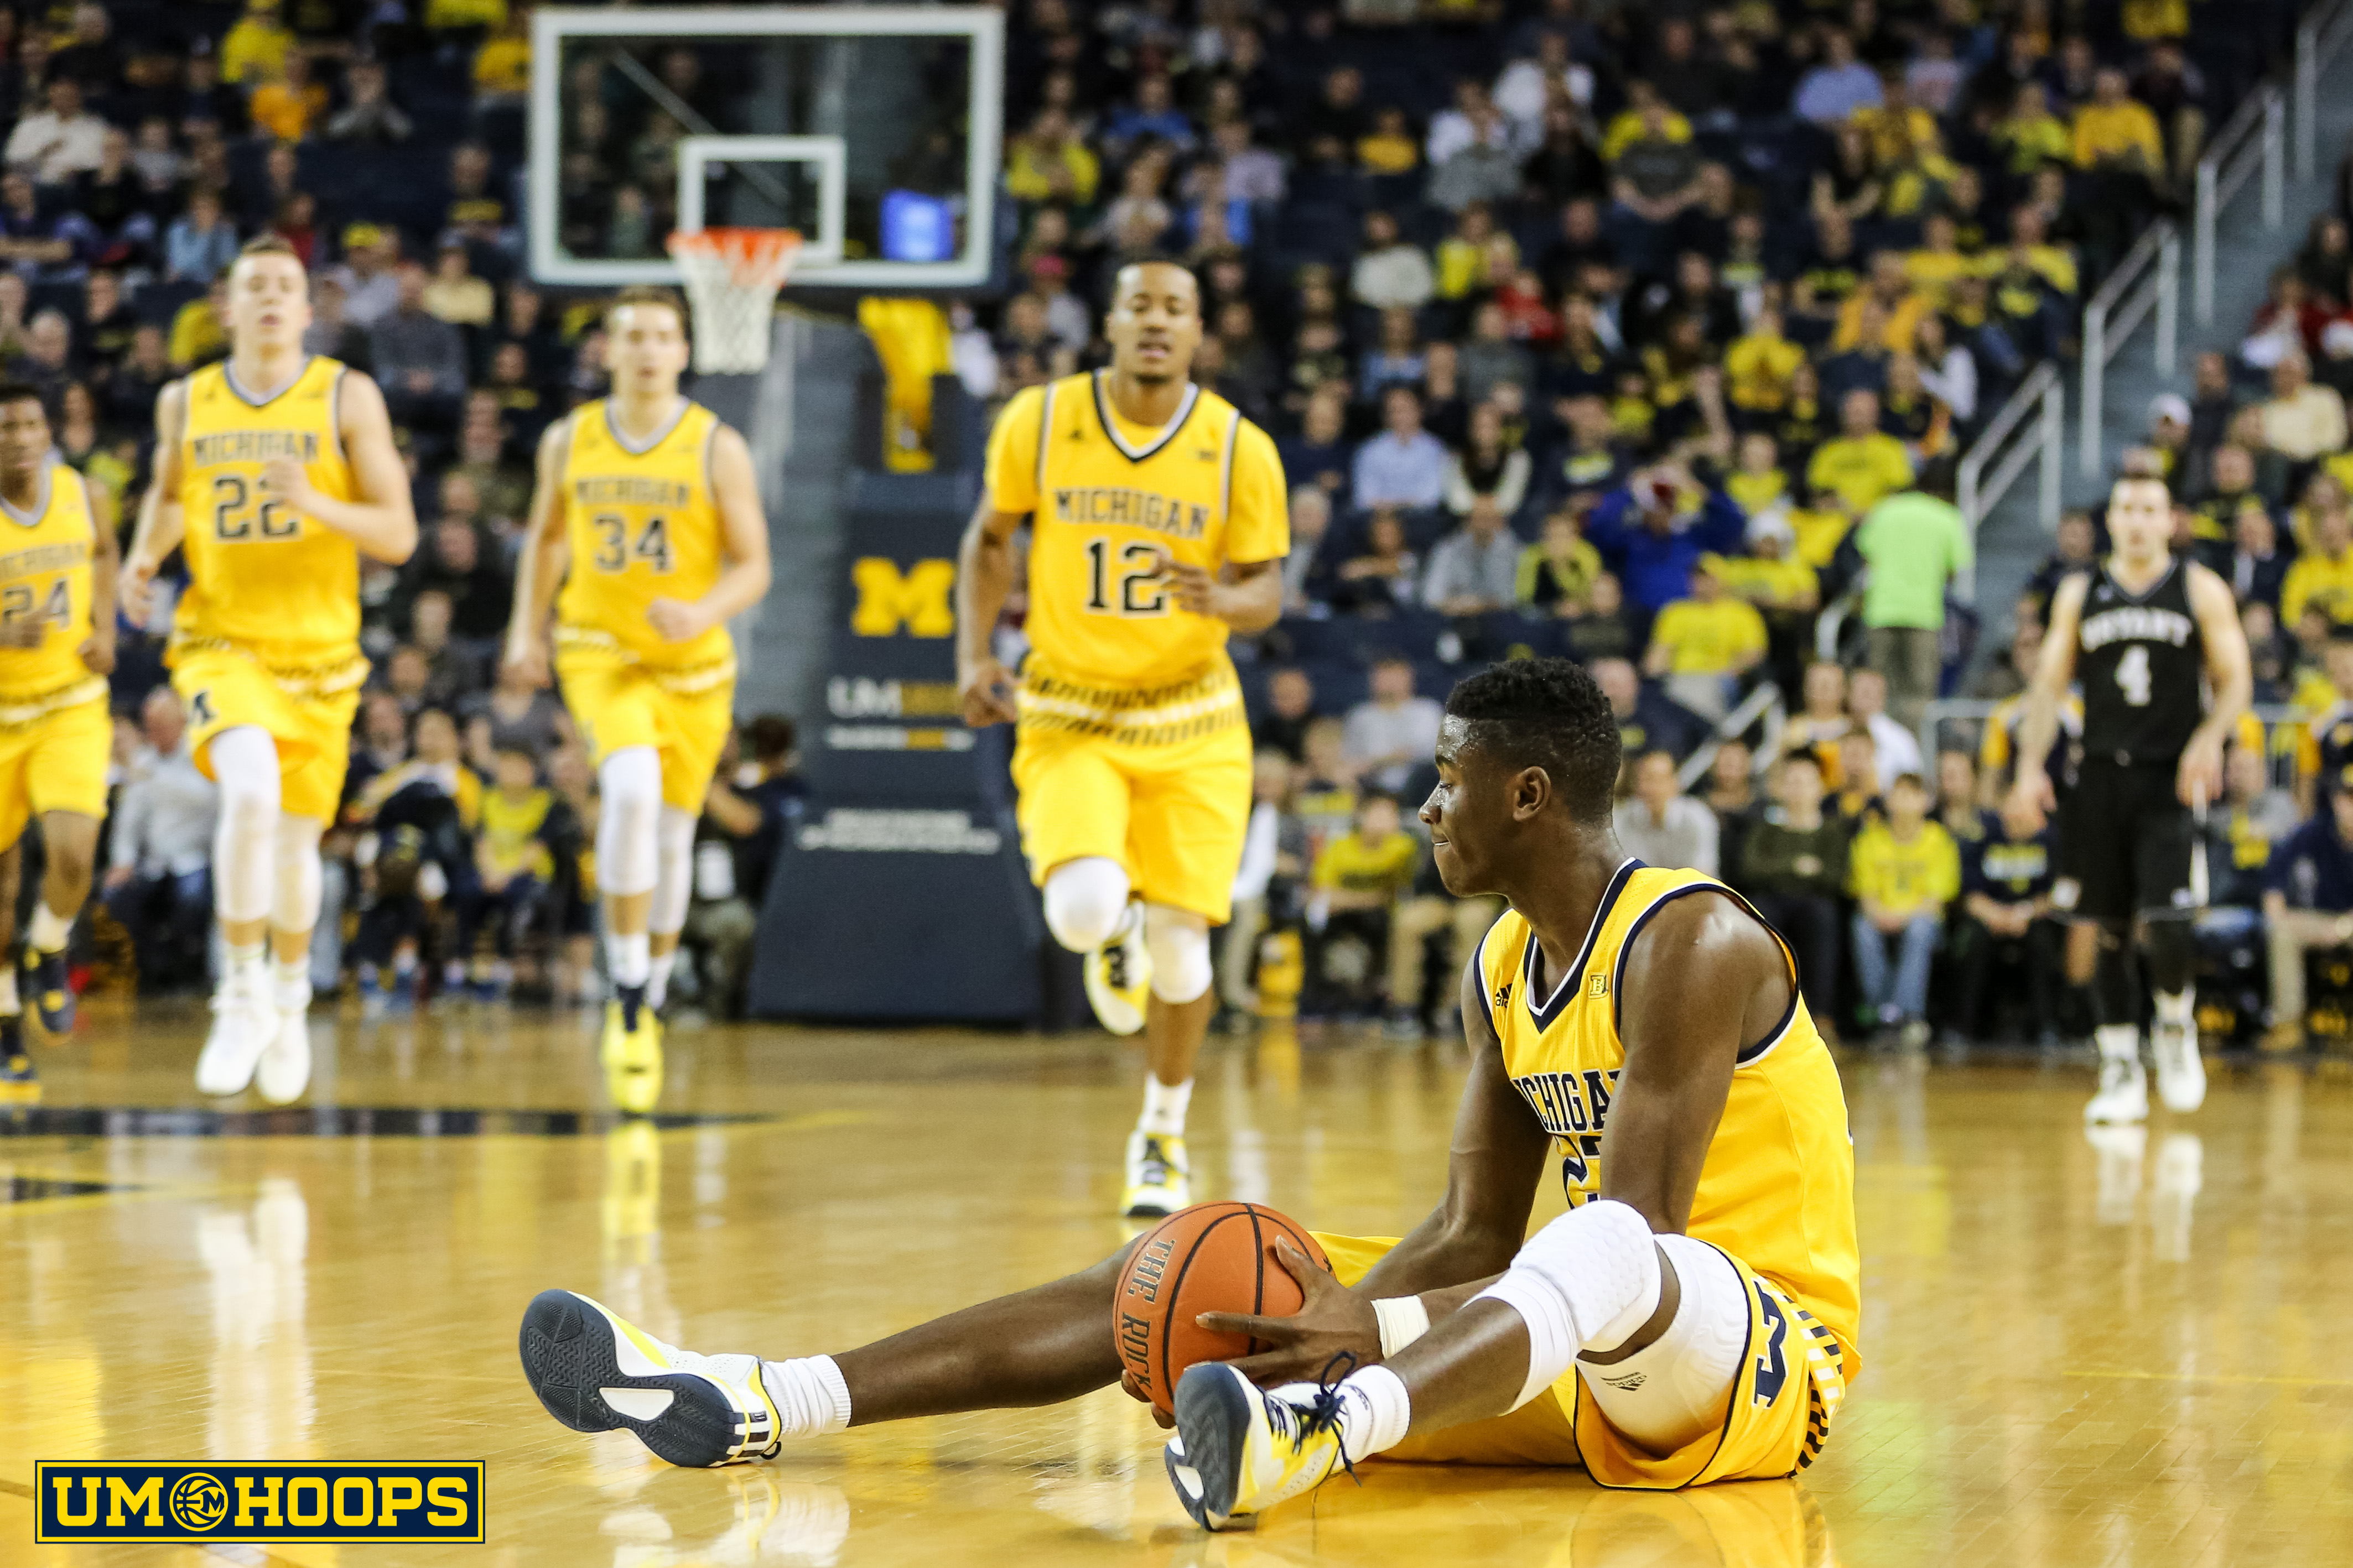 Michigan 96, Bryant 60-12